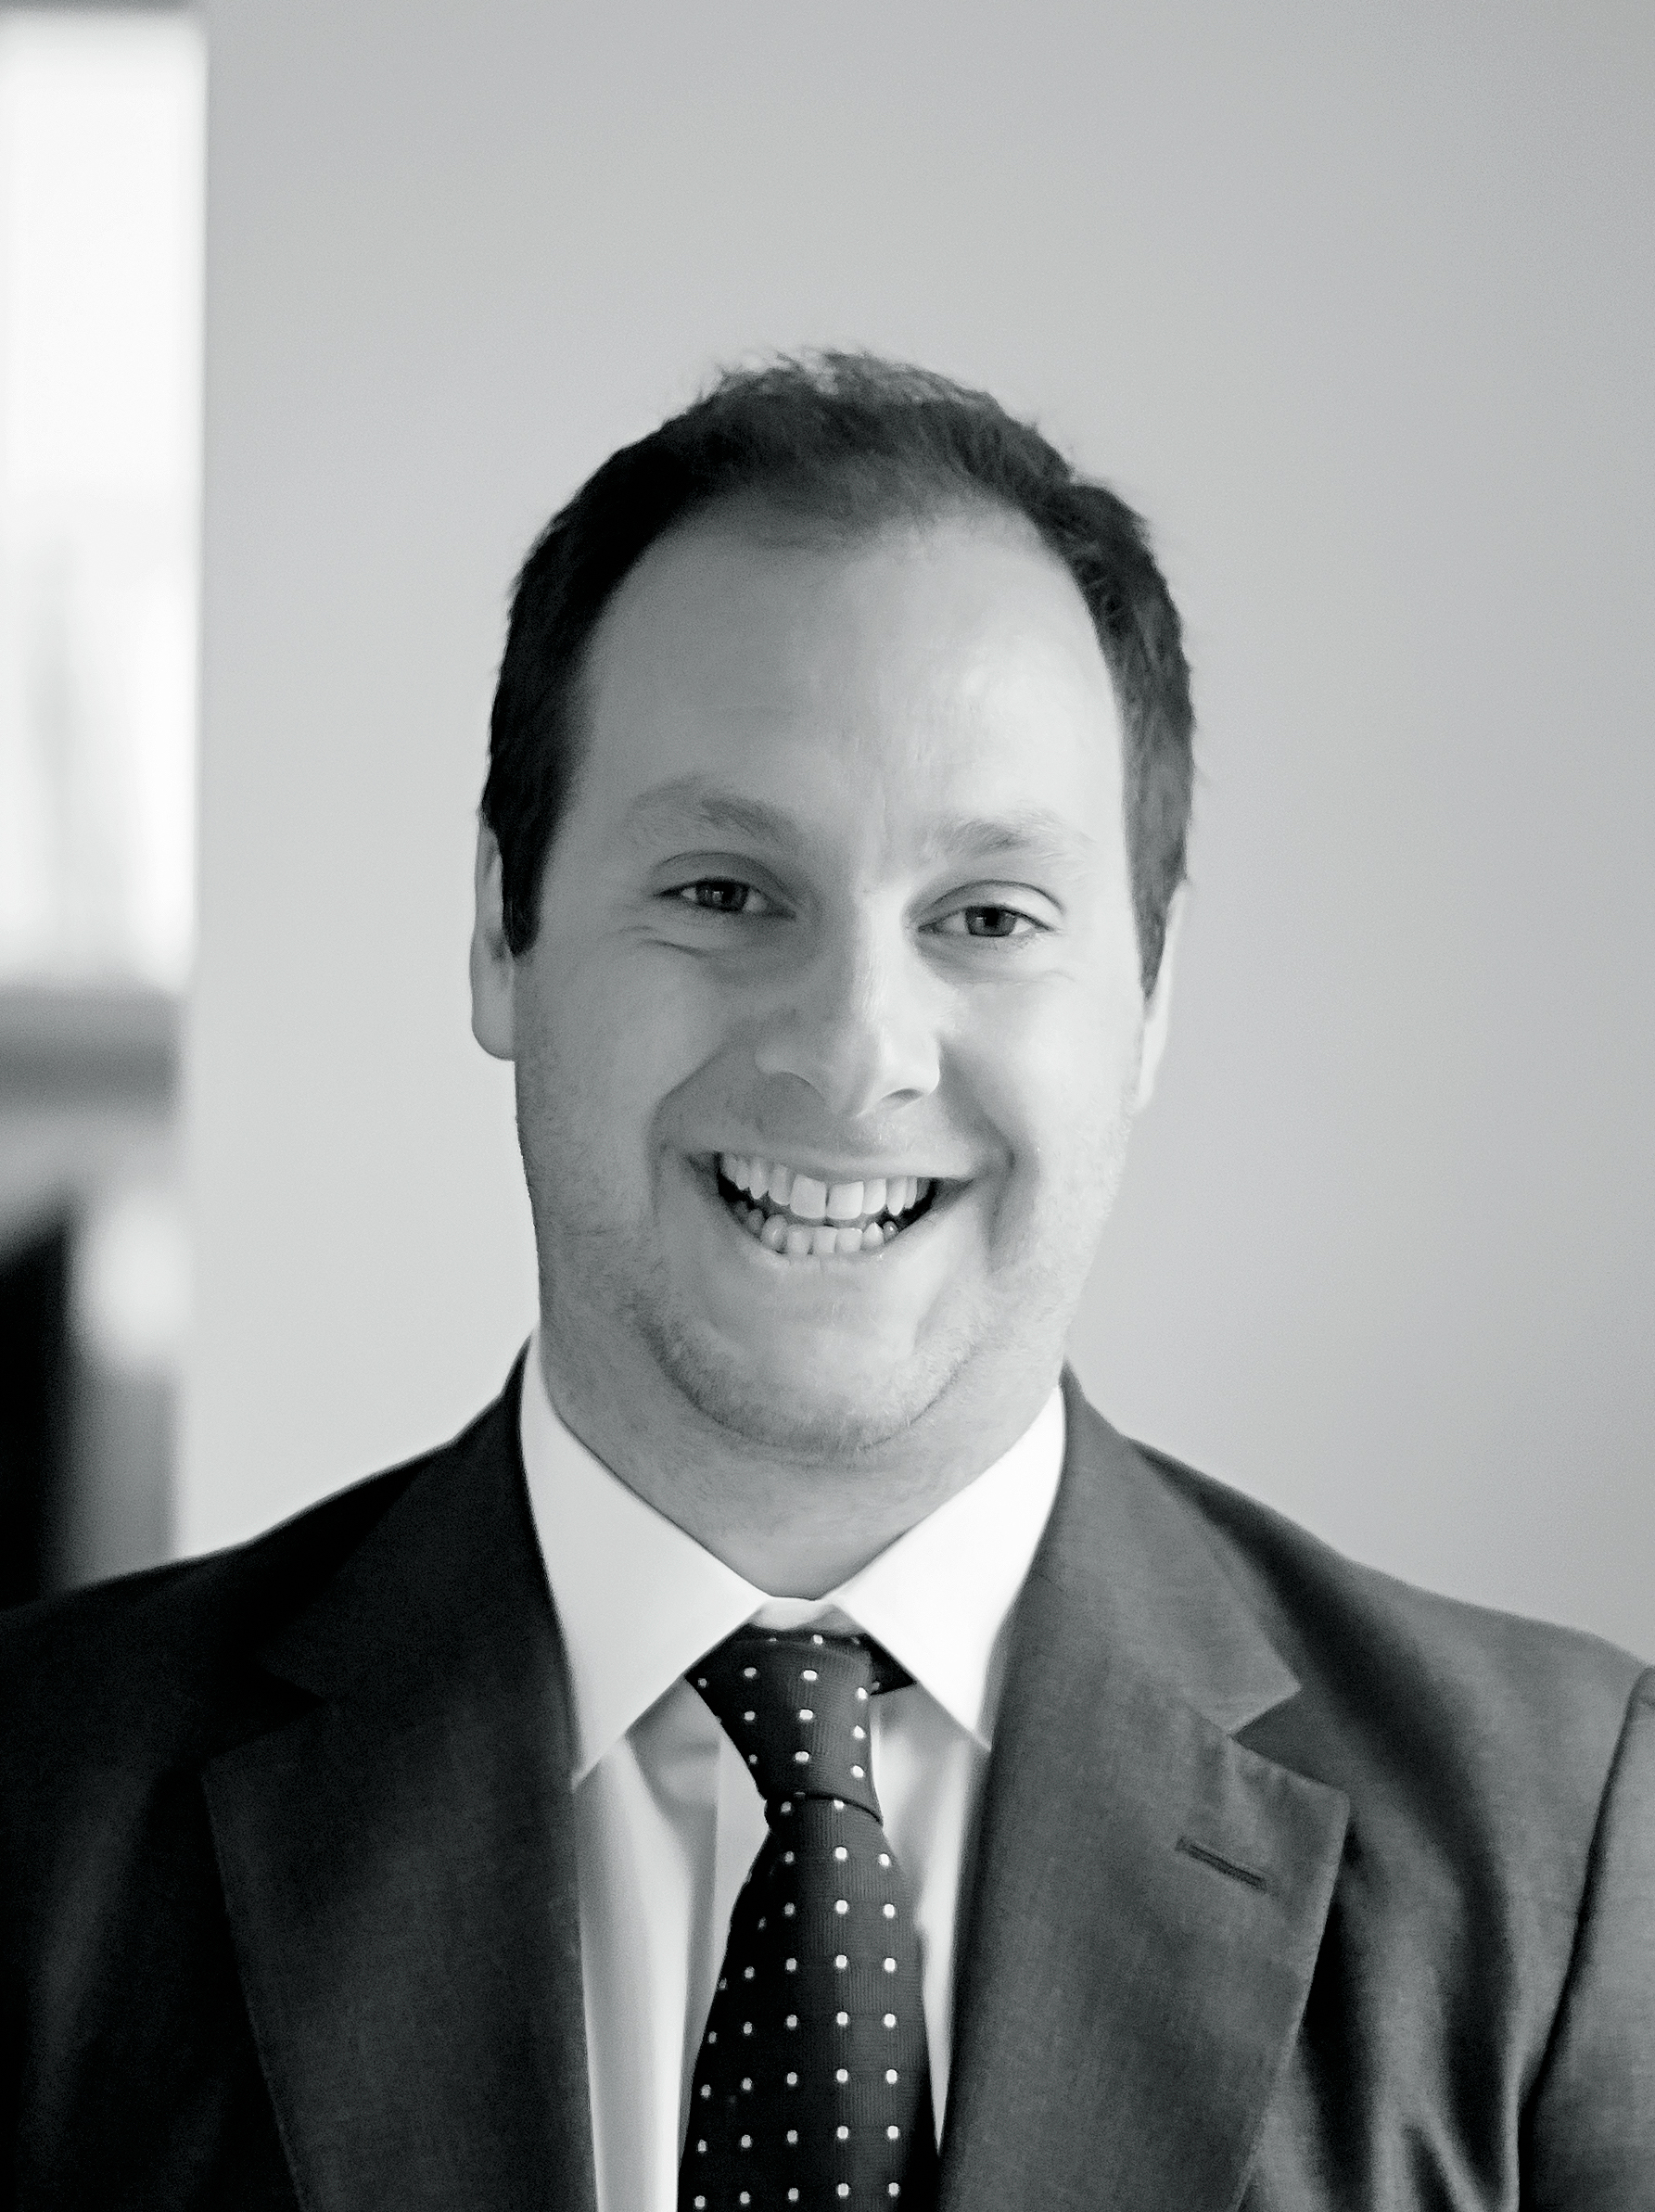 Robert Maltby